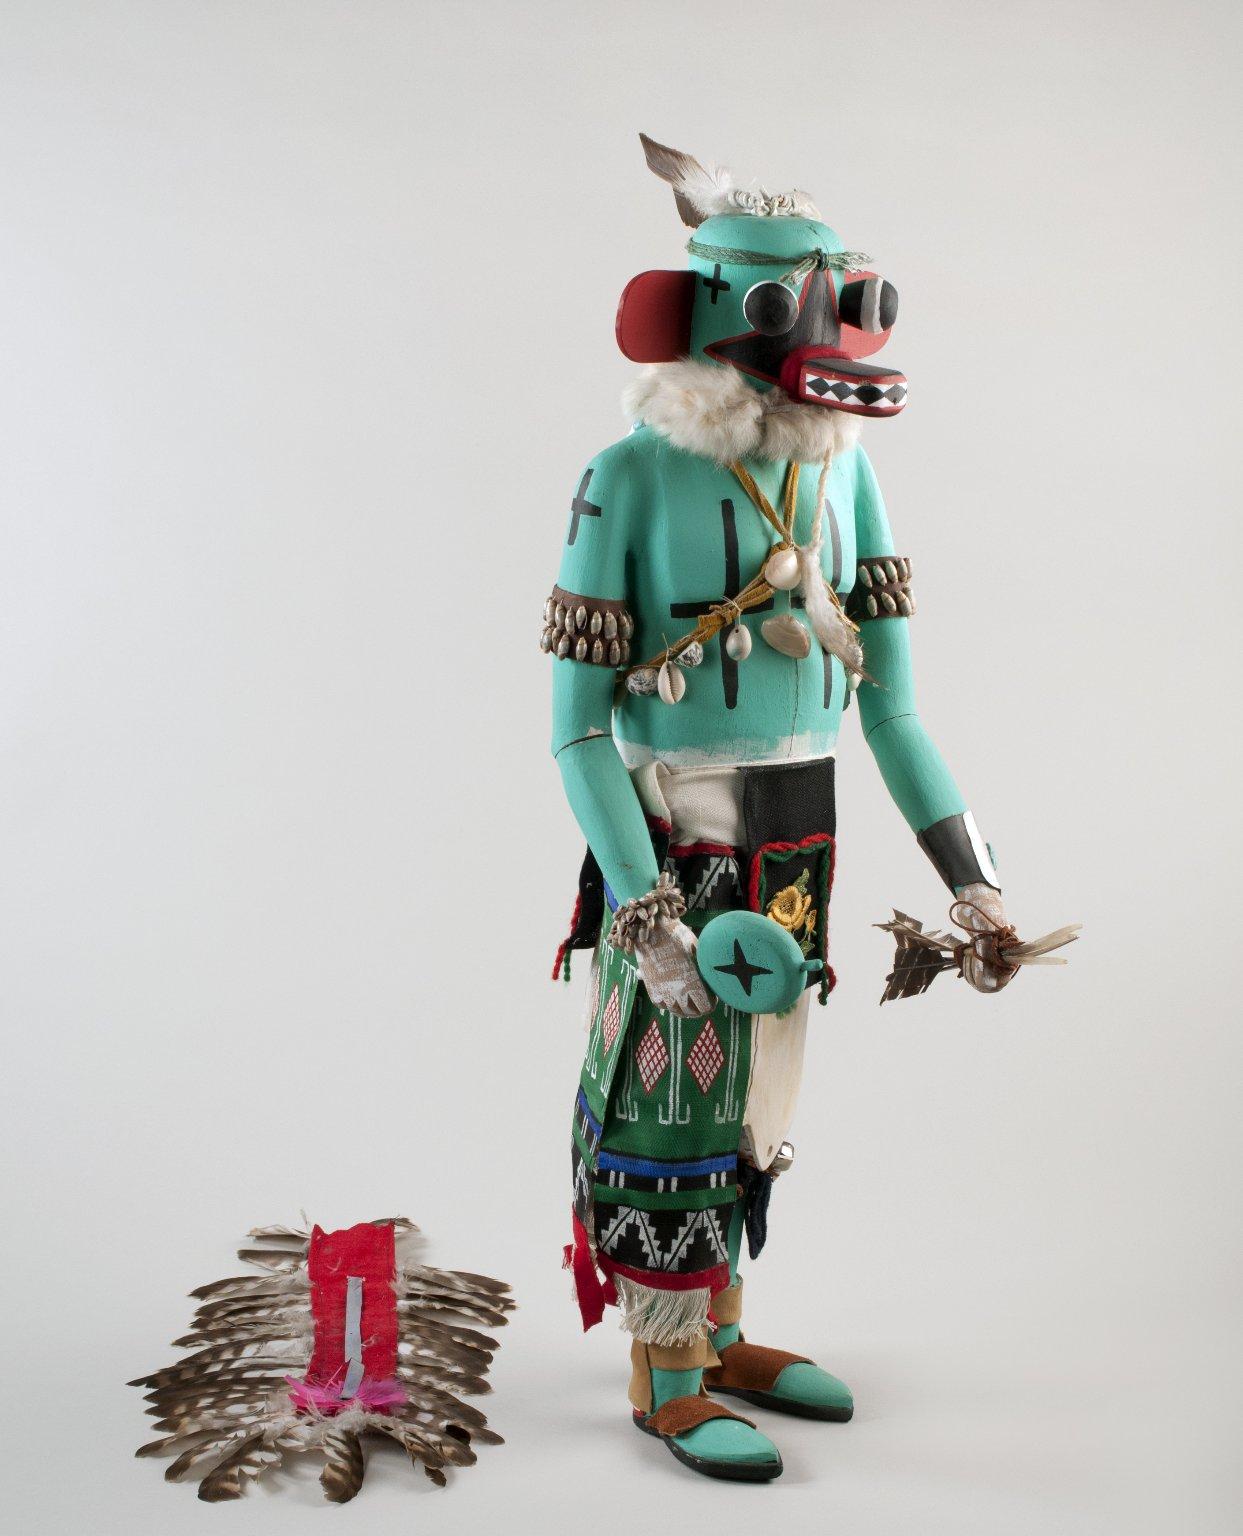 Ho-te Kachina Doll